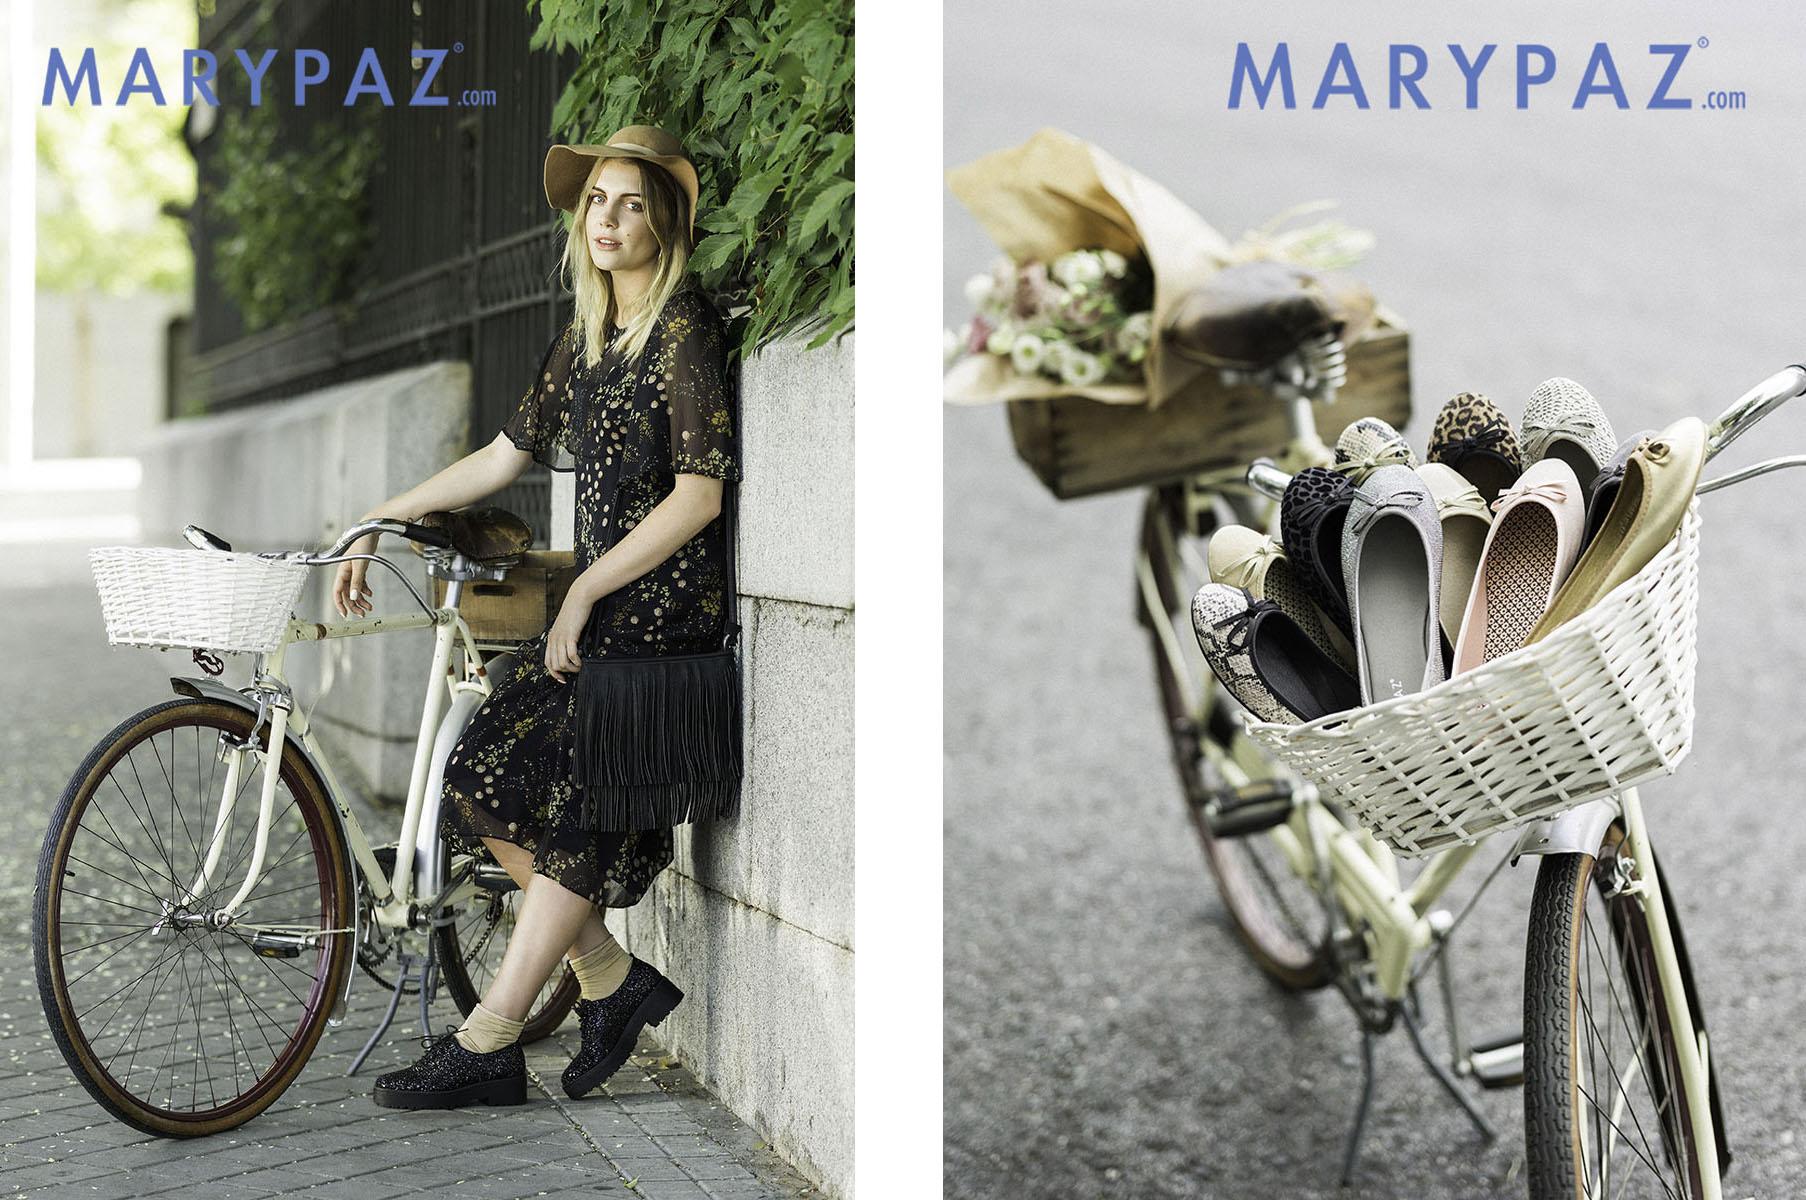 Los Martínez Banco de bicis Alquiler bicicletas Marypaz calzado bailarinas moda